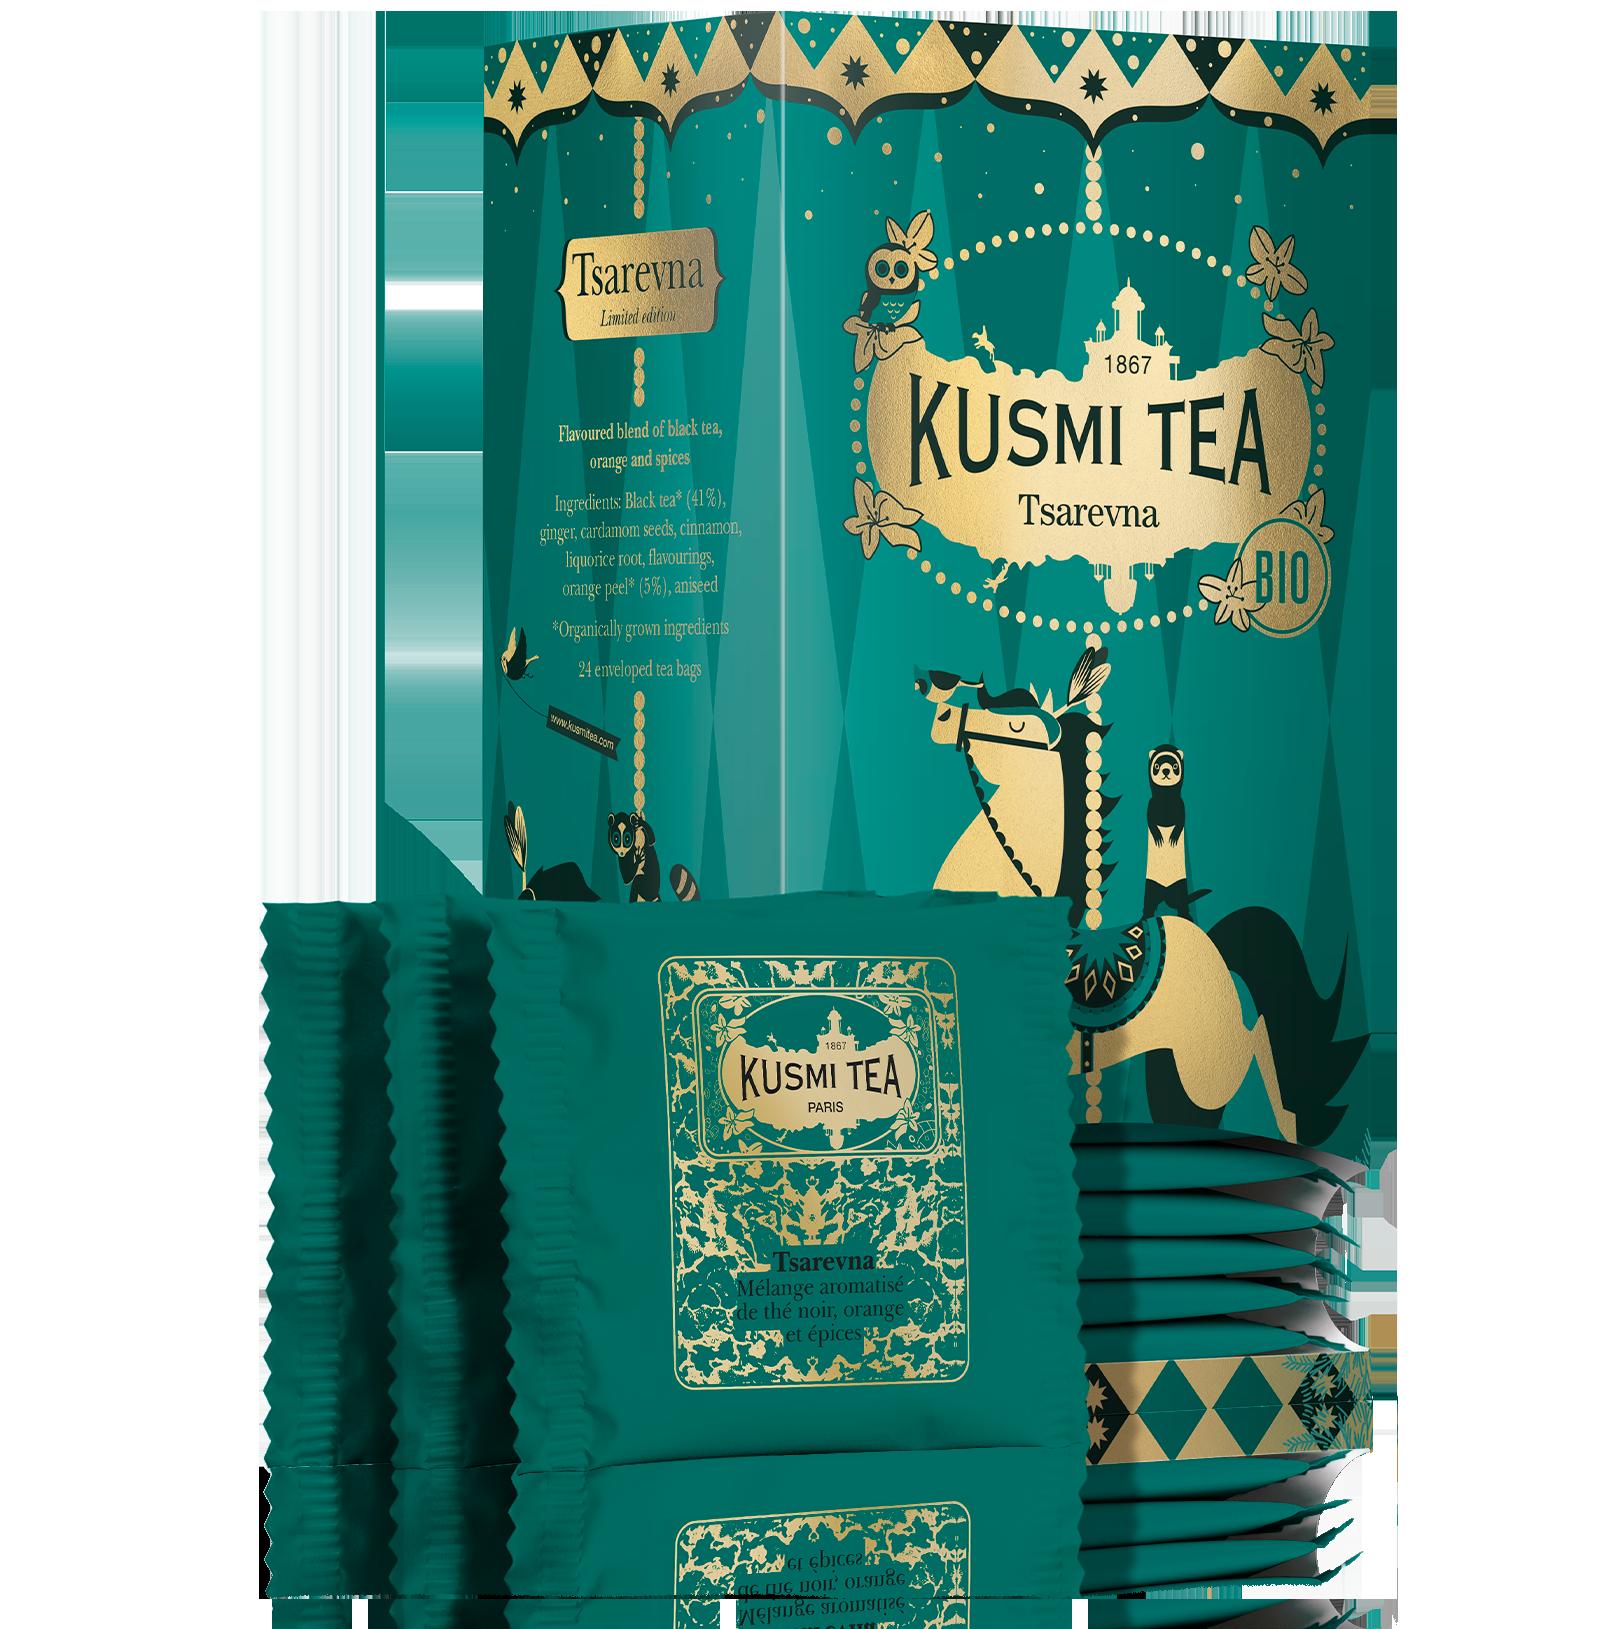 Thé noir - Tsarevna Bio - Vrac - Kusmi Tea